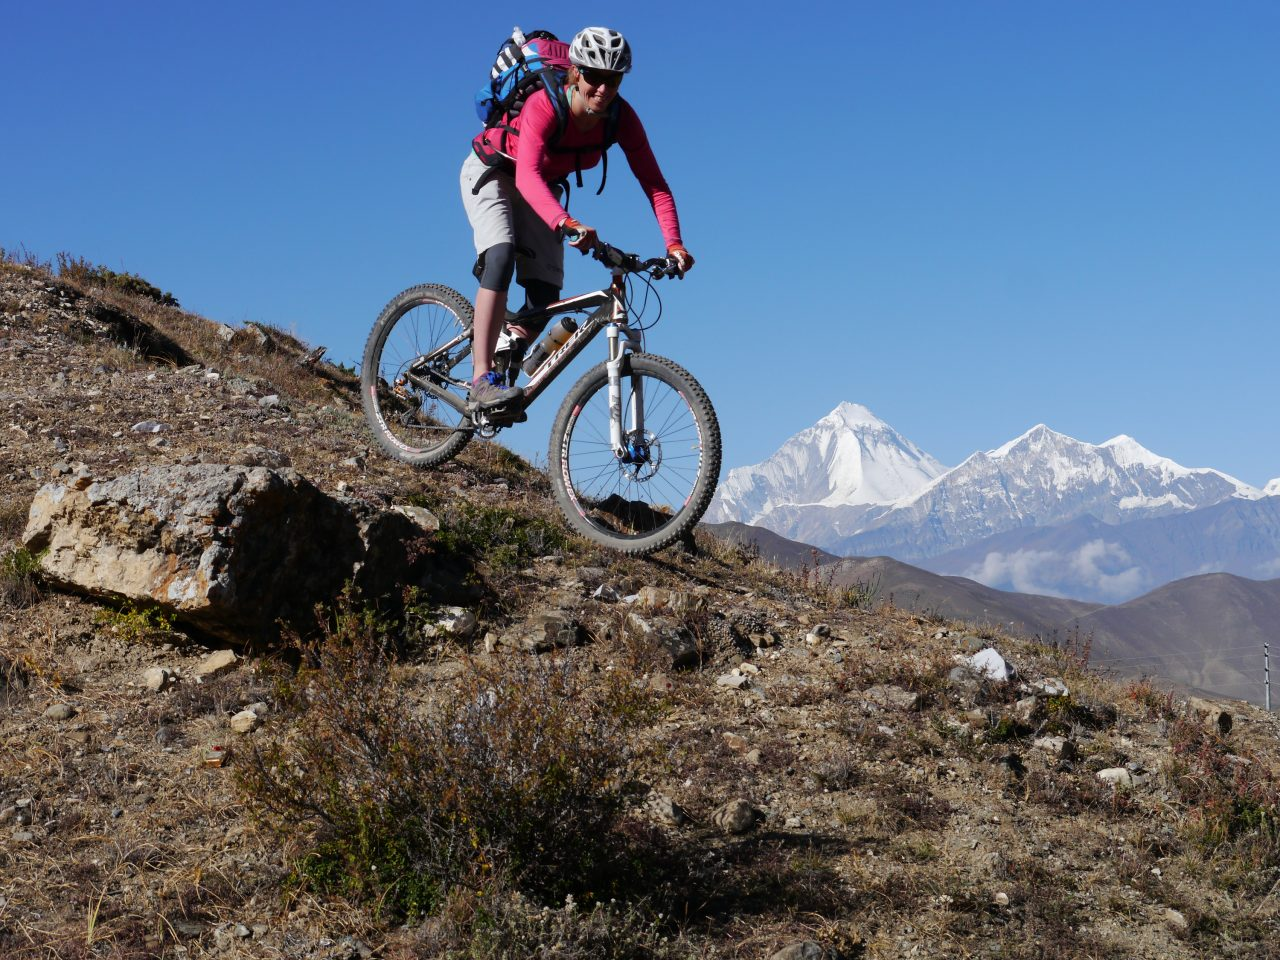 Monatsfrau Claudia Knoll Mountainbike